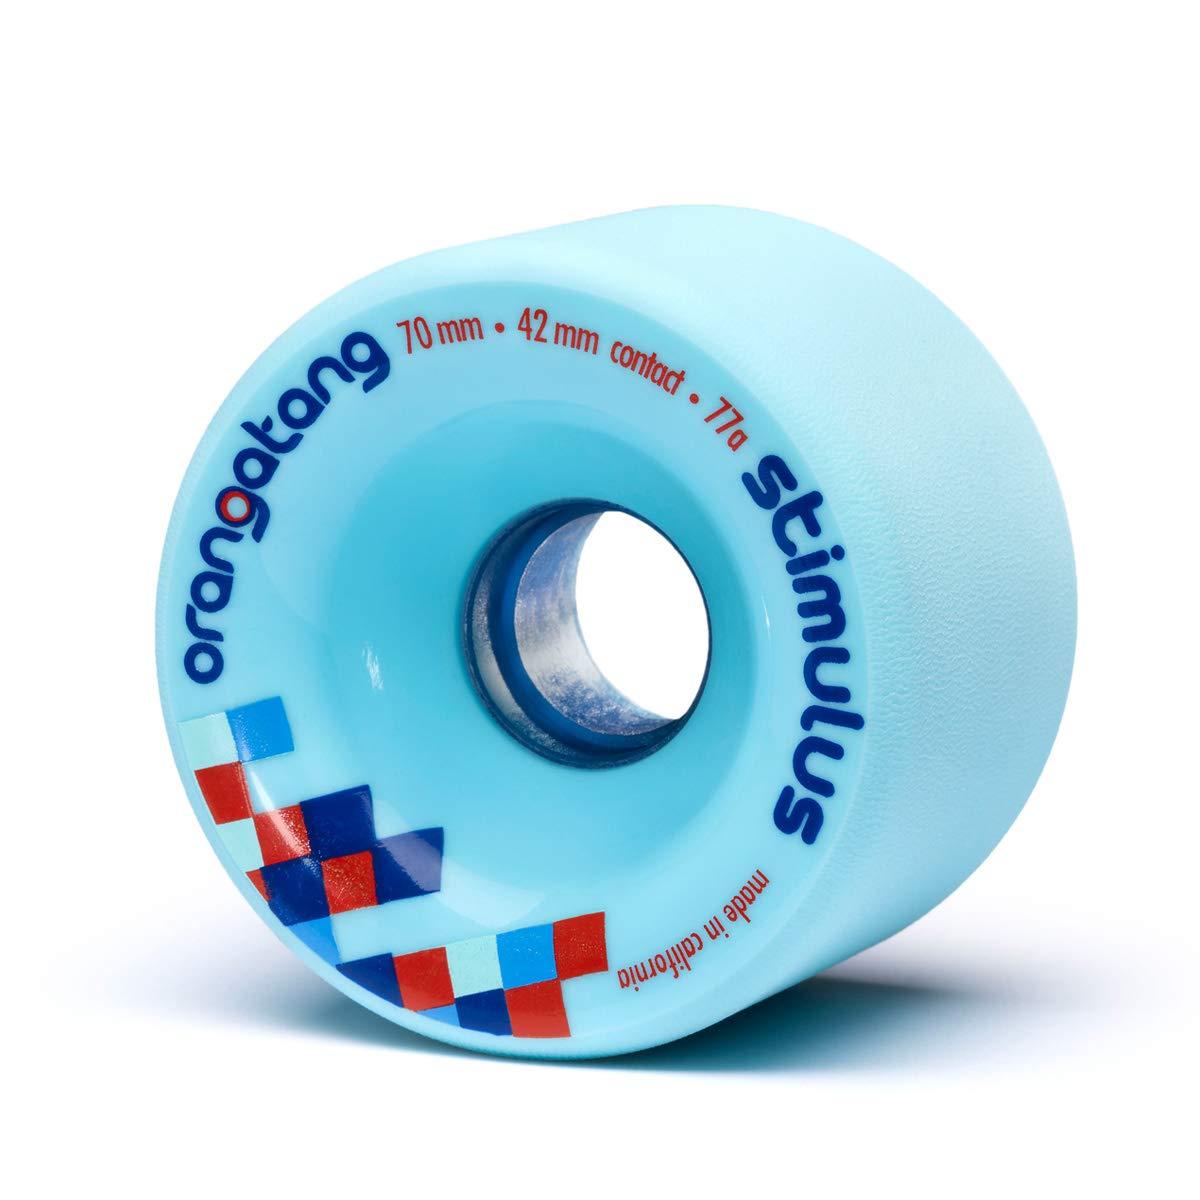 Orangatang Stimulus 70 mm 77a Freeride Longboard Skateboard Wheels w/Loaded Jehu V2 Bearings (Blue, Set of 4) by Orangatang